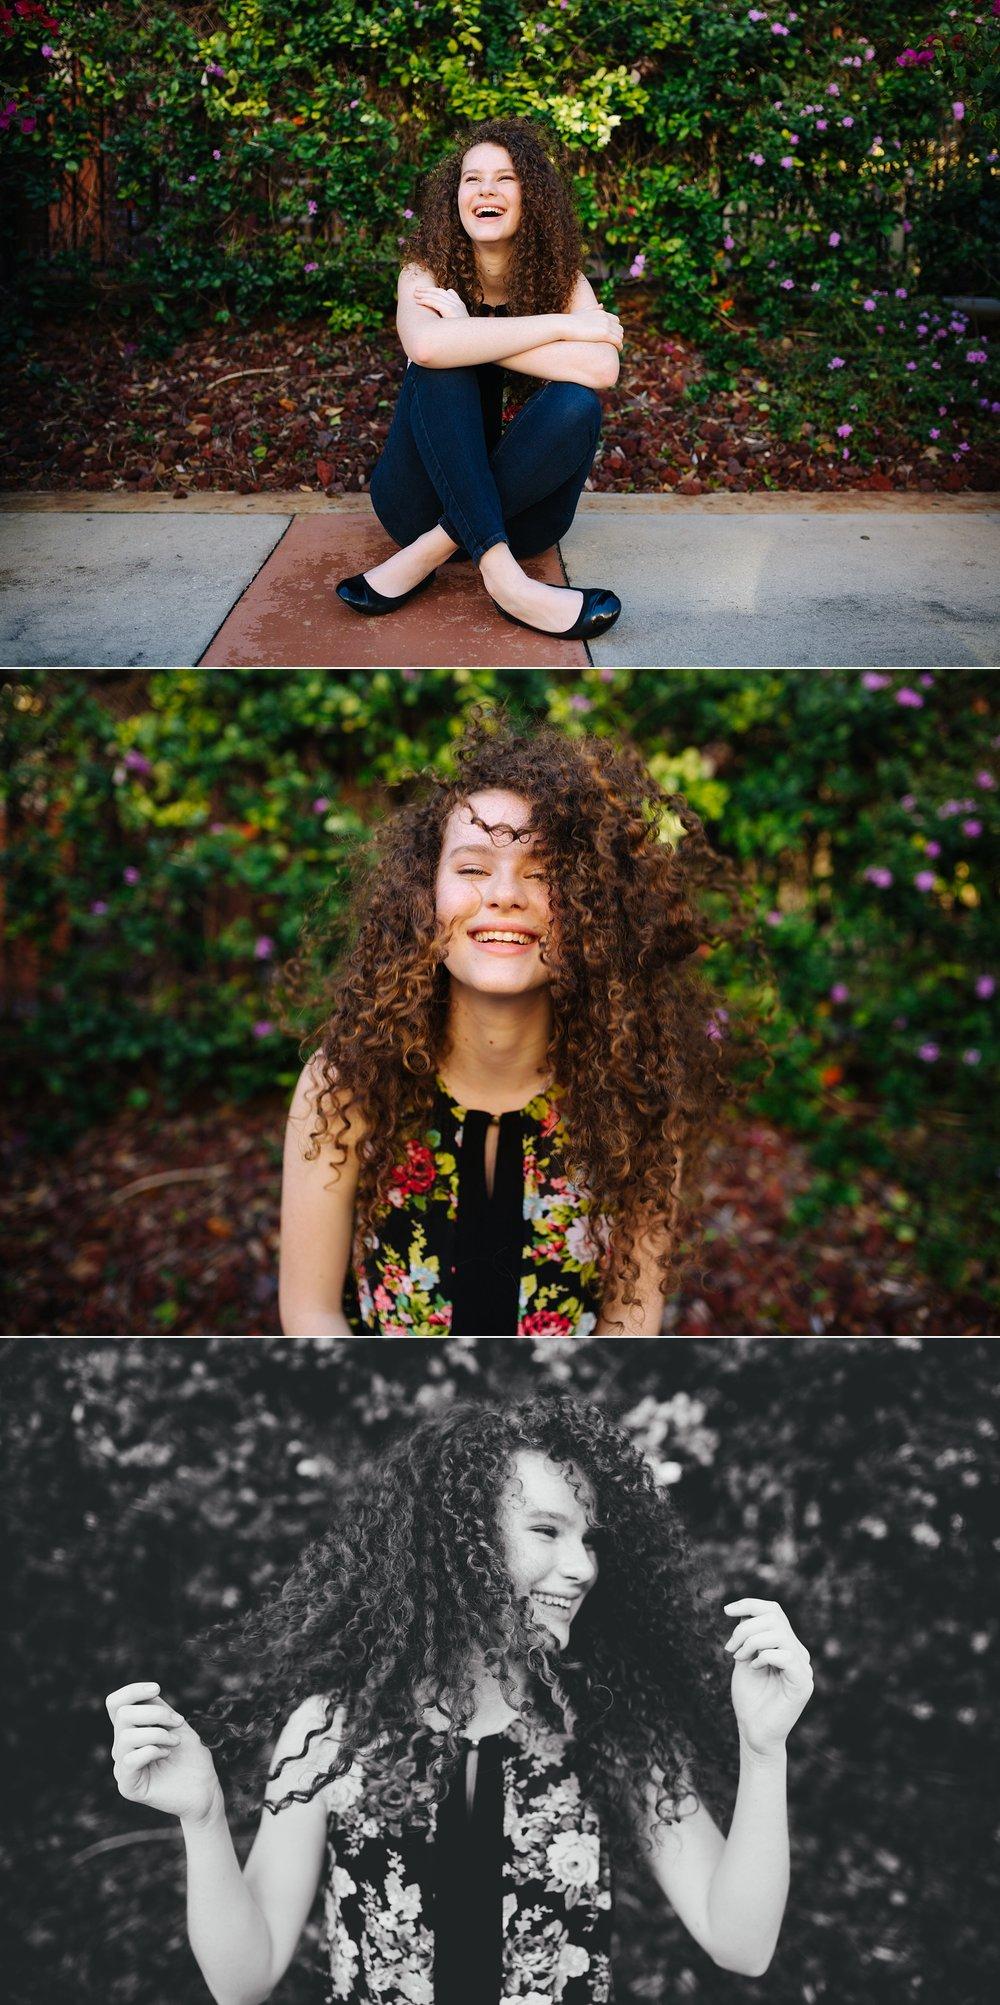 0347f-yborcityseniorportraitsurbanseniorportraitsmodernseniorportraitsjakeandkatiephotography-009.jpg